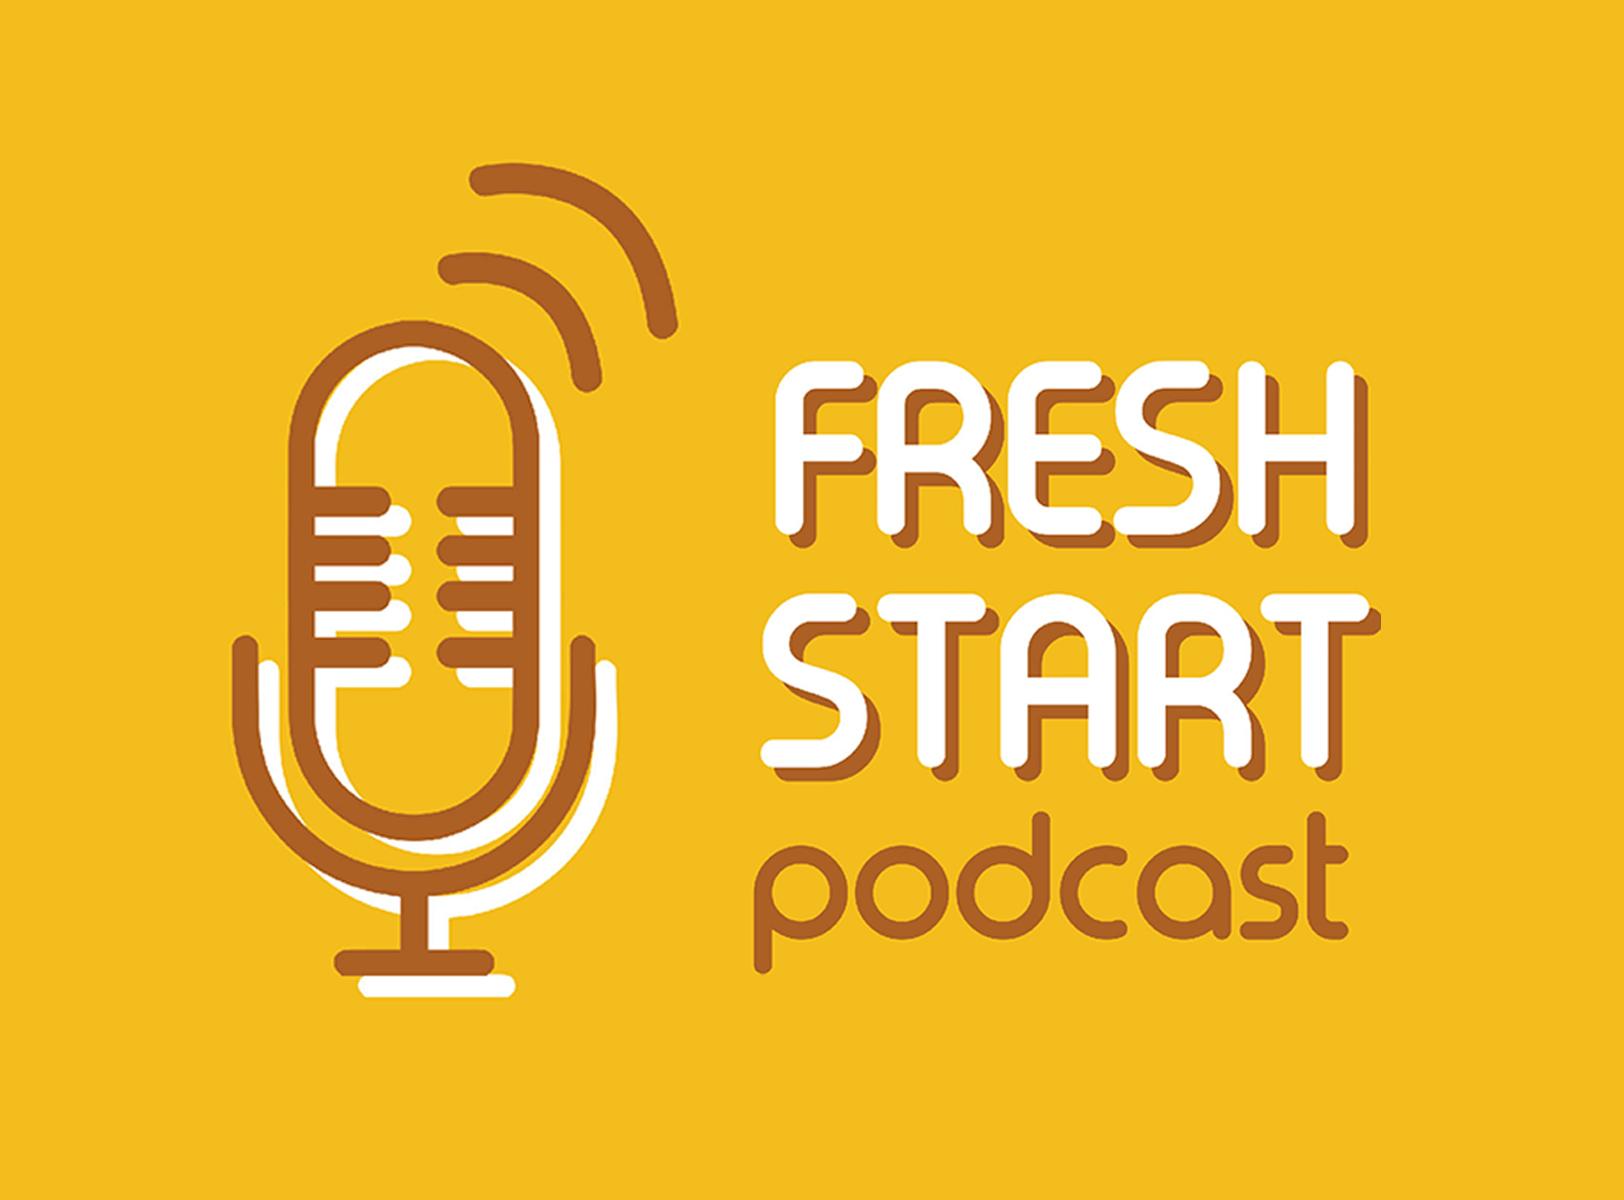 Fresh Start: Podcast News (4/12/2019 Fri.)